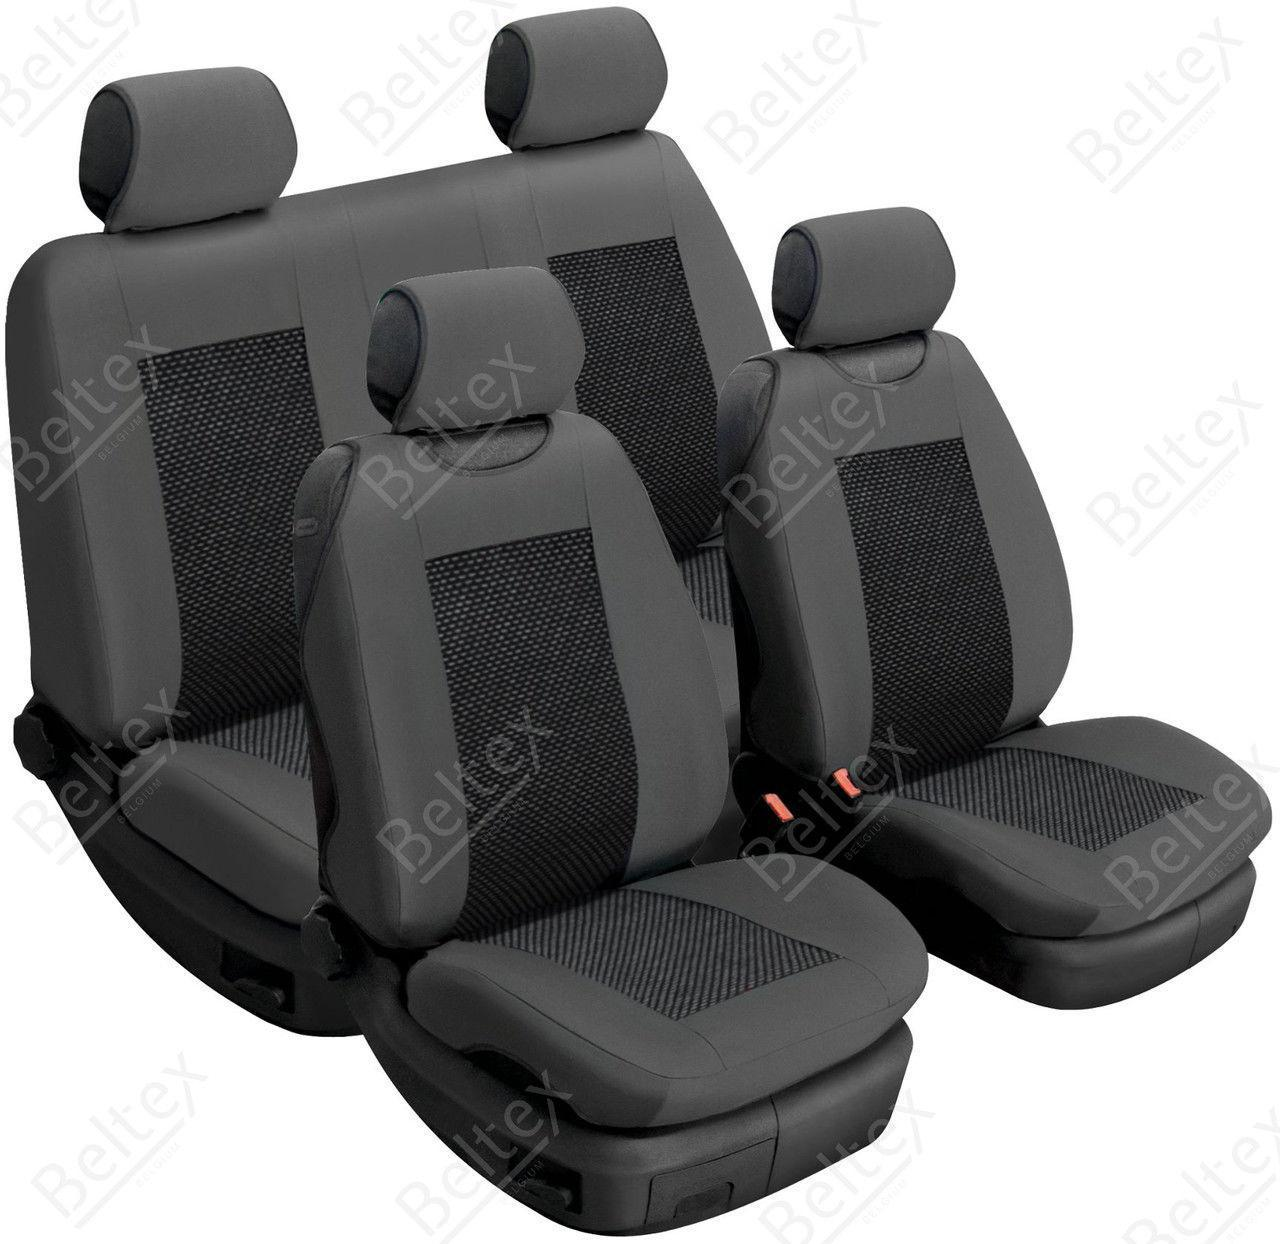 Майки/чехлы на сиденья Ауди А4 Б5 (Audi A4 B5)